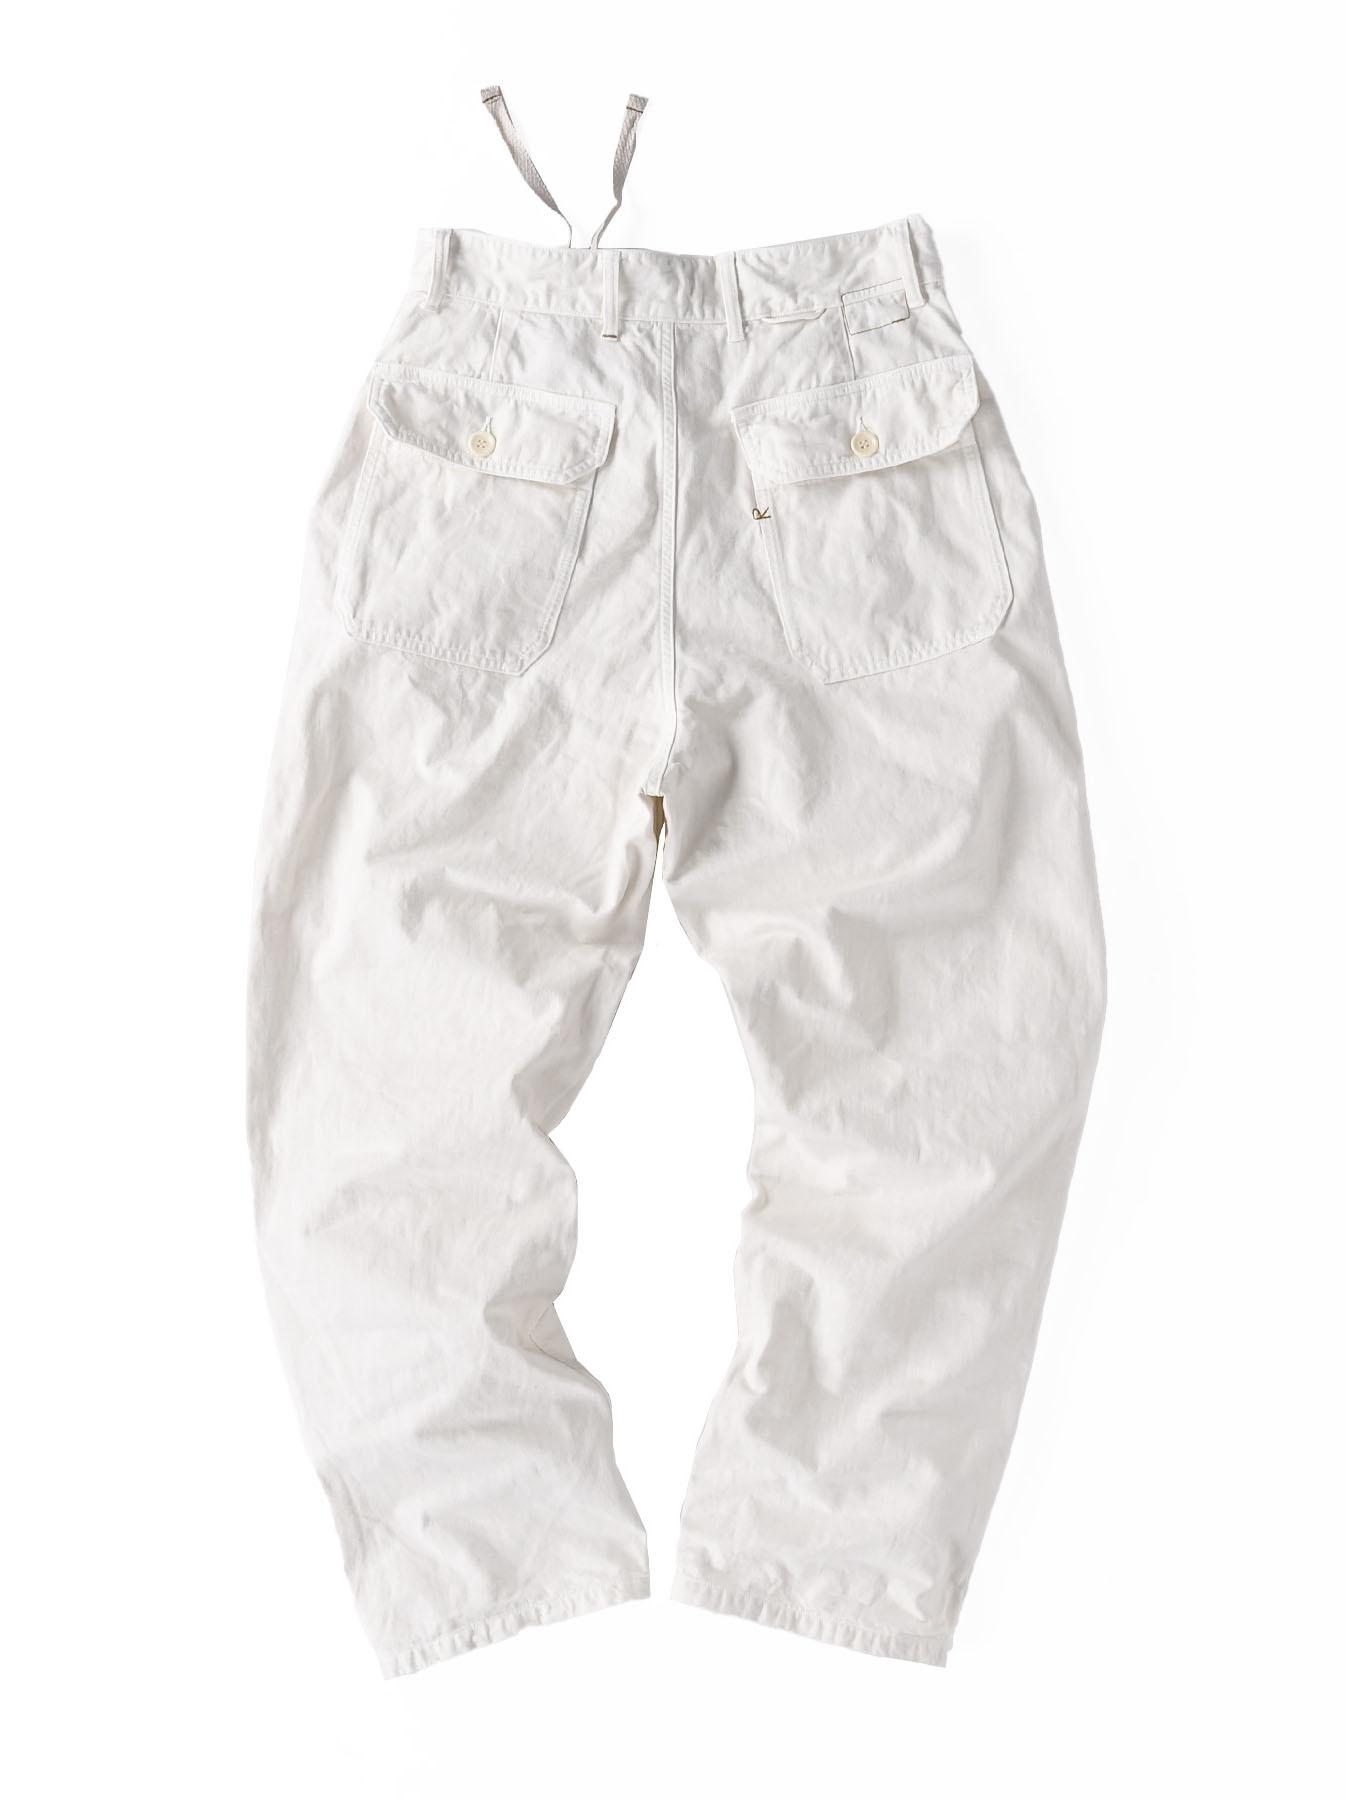 Yacht Cotton White 908 Baker Pants (0521)-4